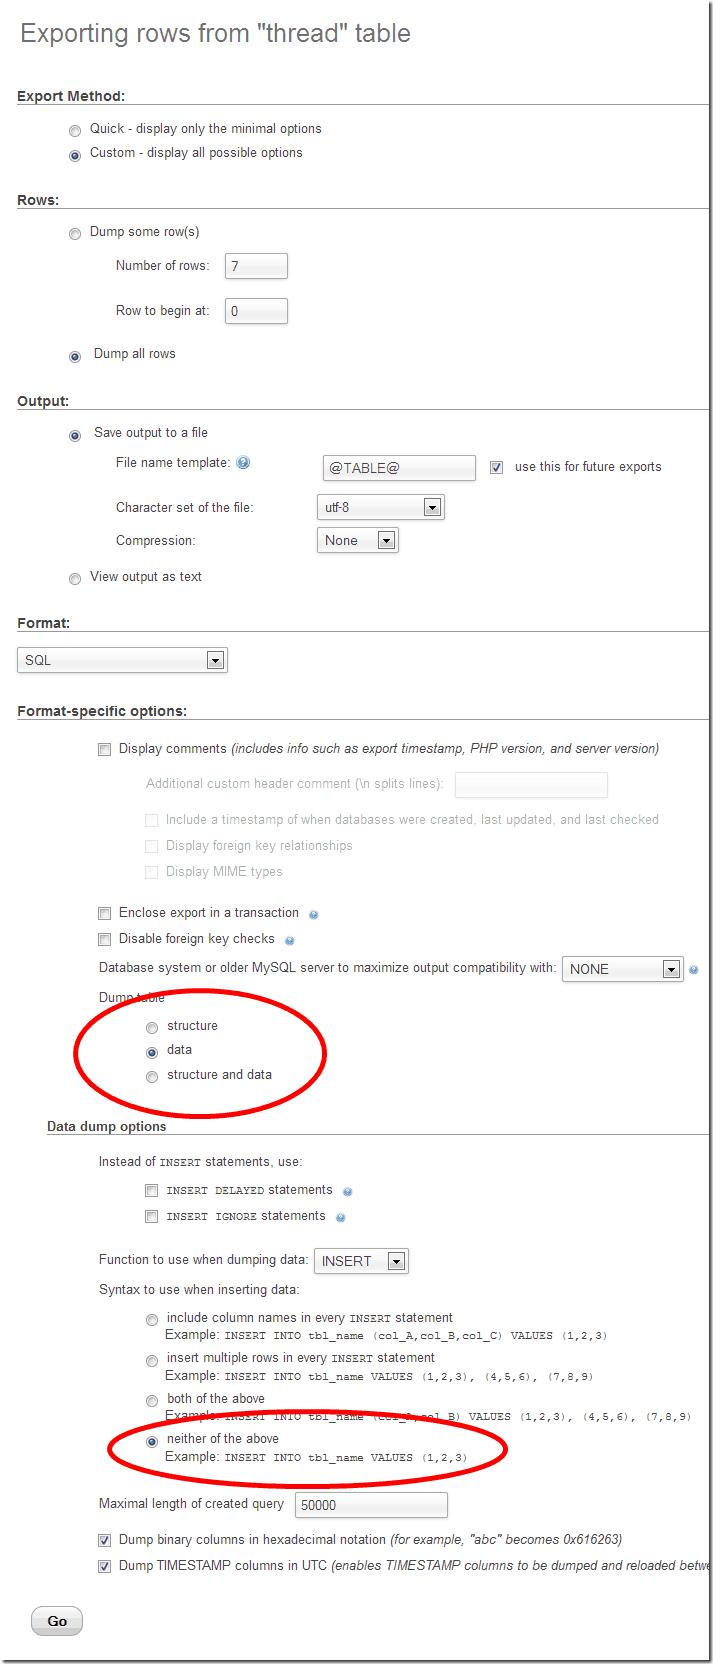 phpmyadmin-export-settings